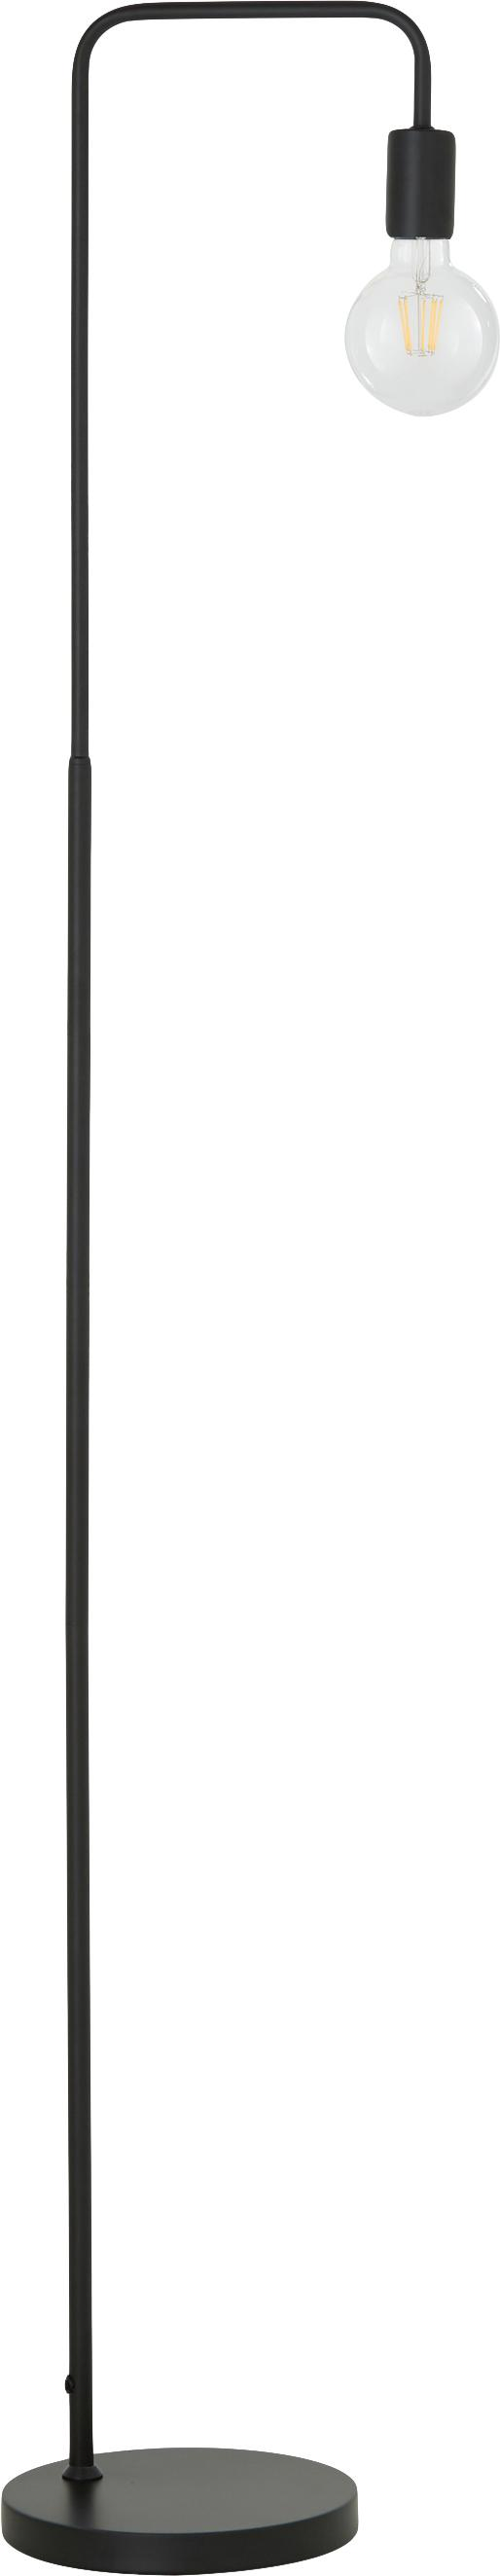 Lampada da terra nera Flow, Nero, nero, Larg. 33 x Alt. 153 cm